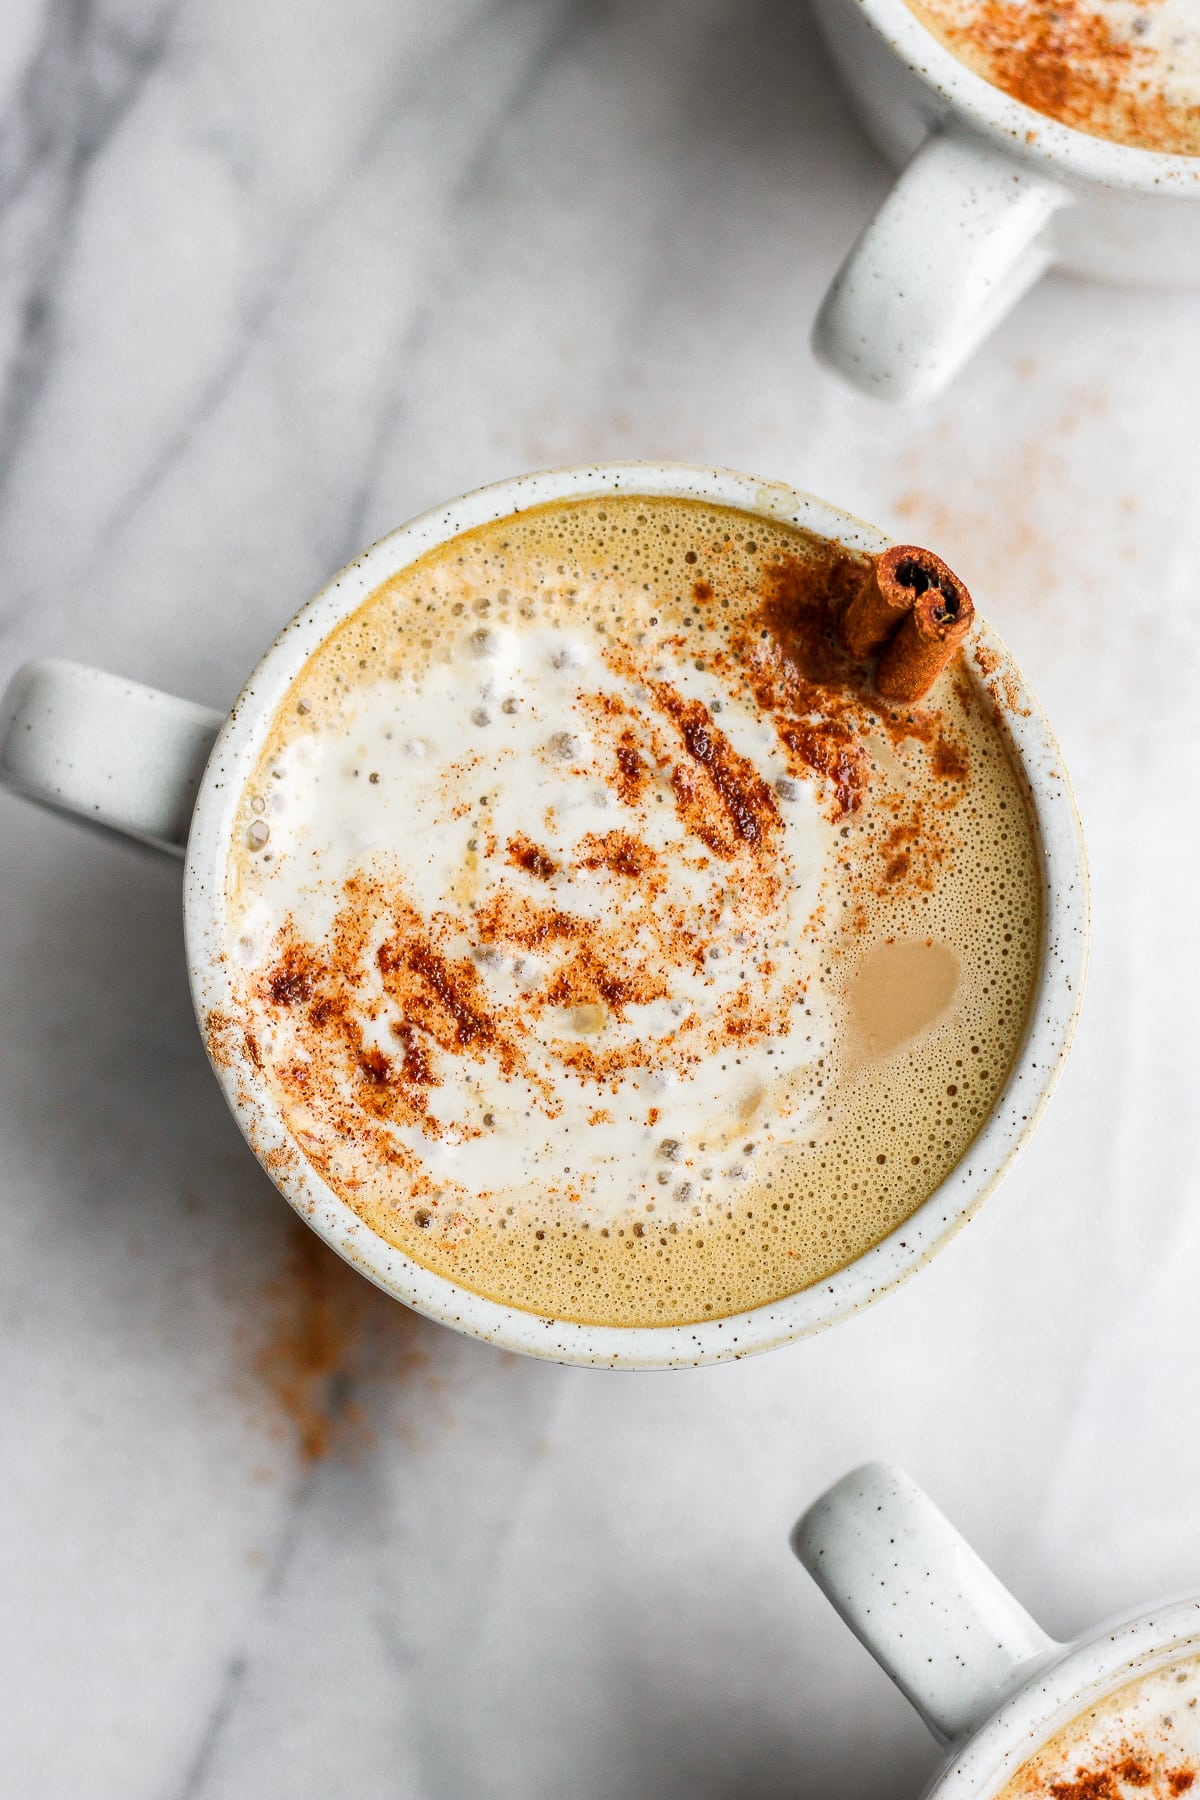 Dairy-Free Pumpkin Spice Latte - a healthier version of your classic pumpkin spice latte! #paleo #dairyfree #pumpkinspice #coffee